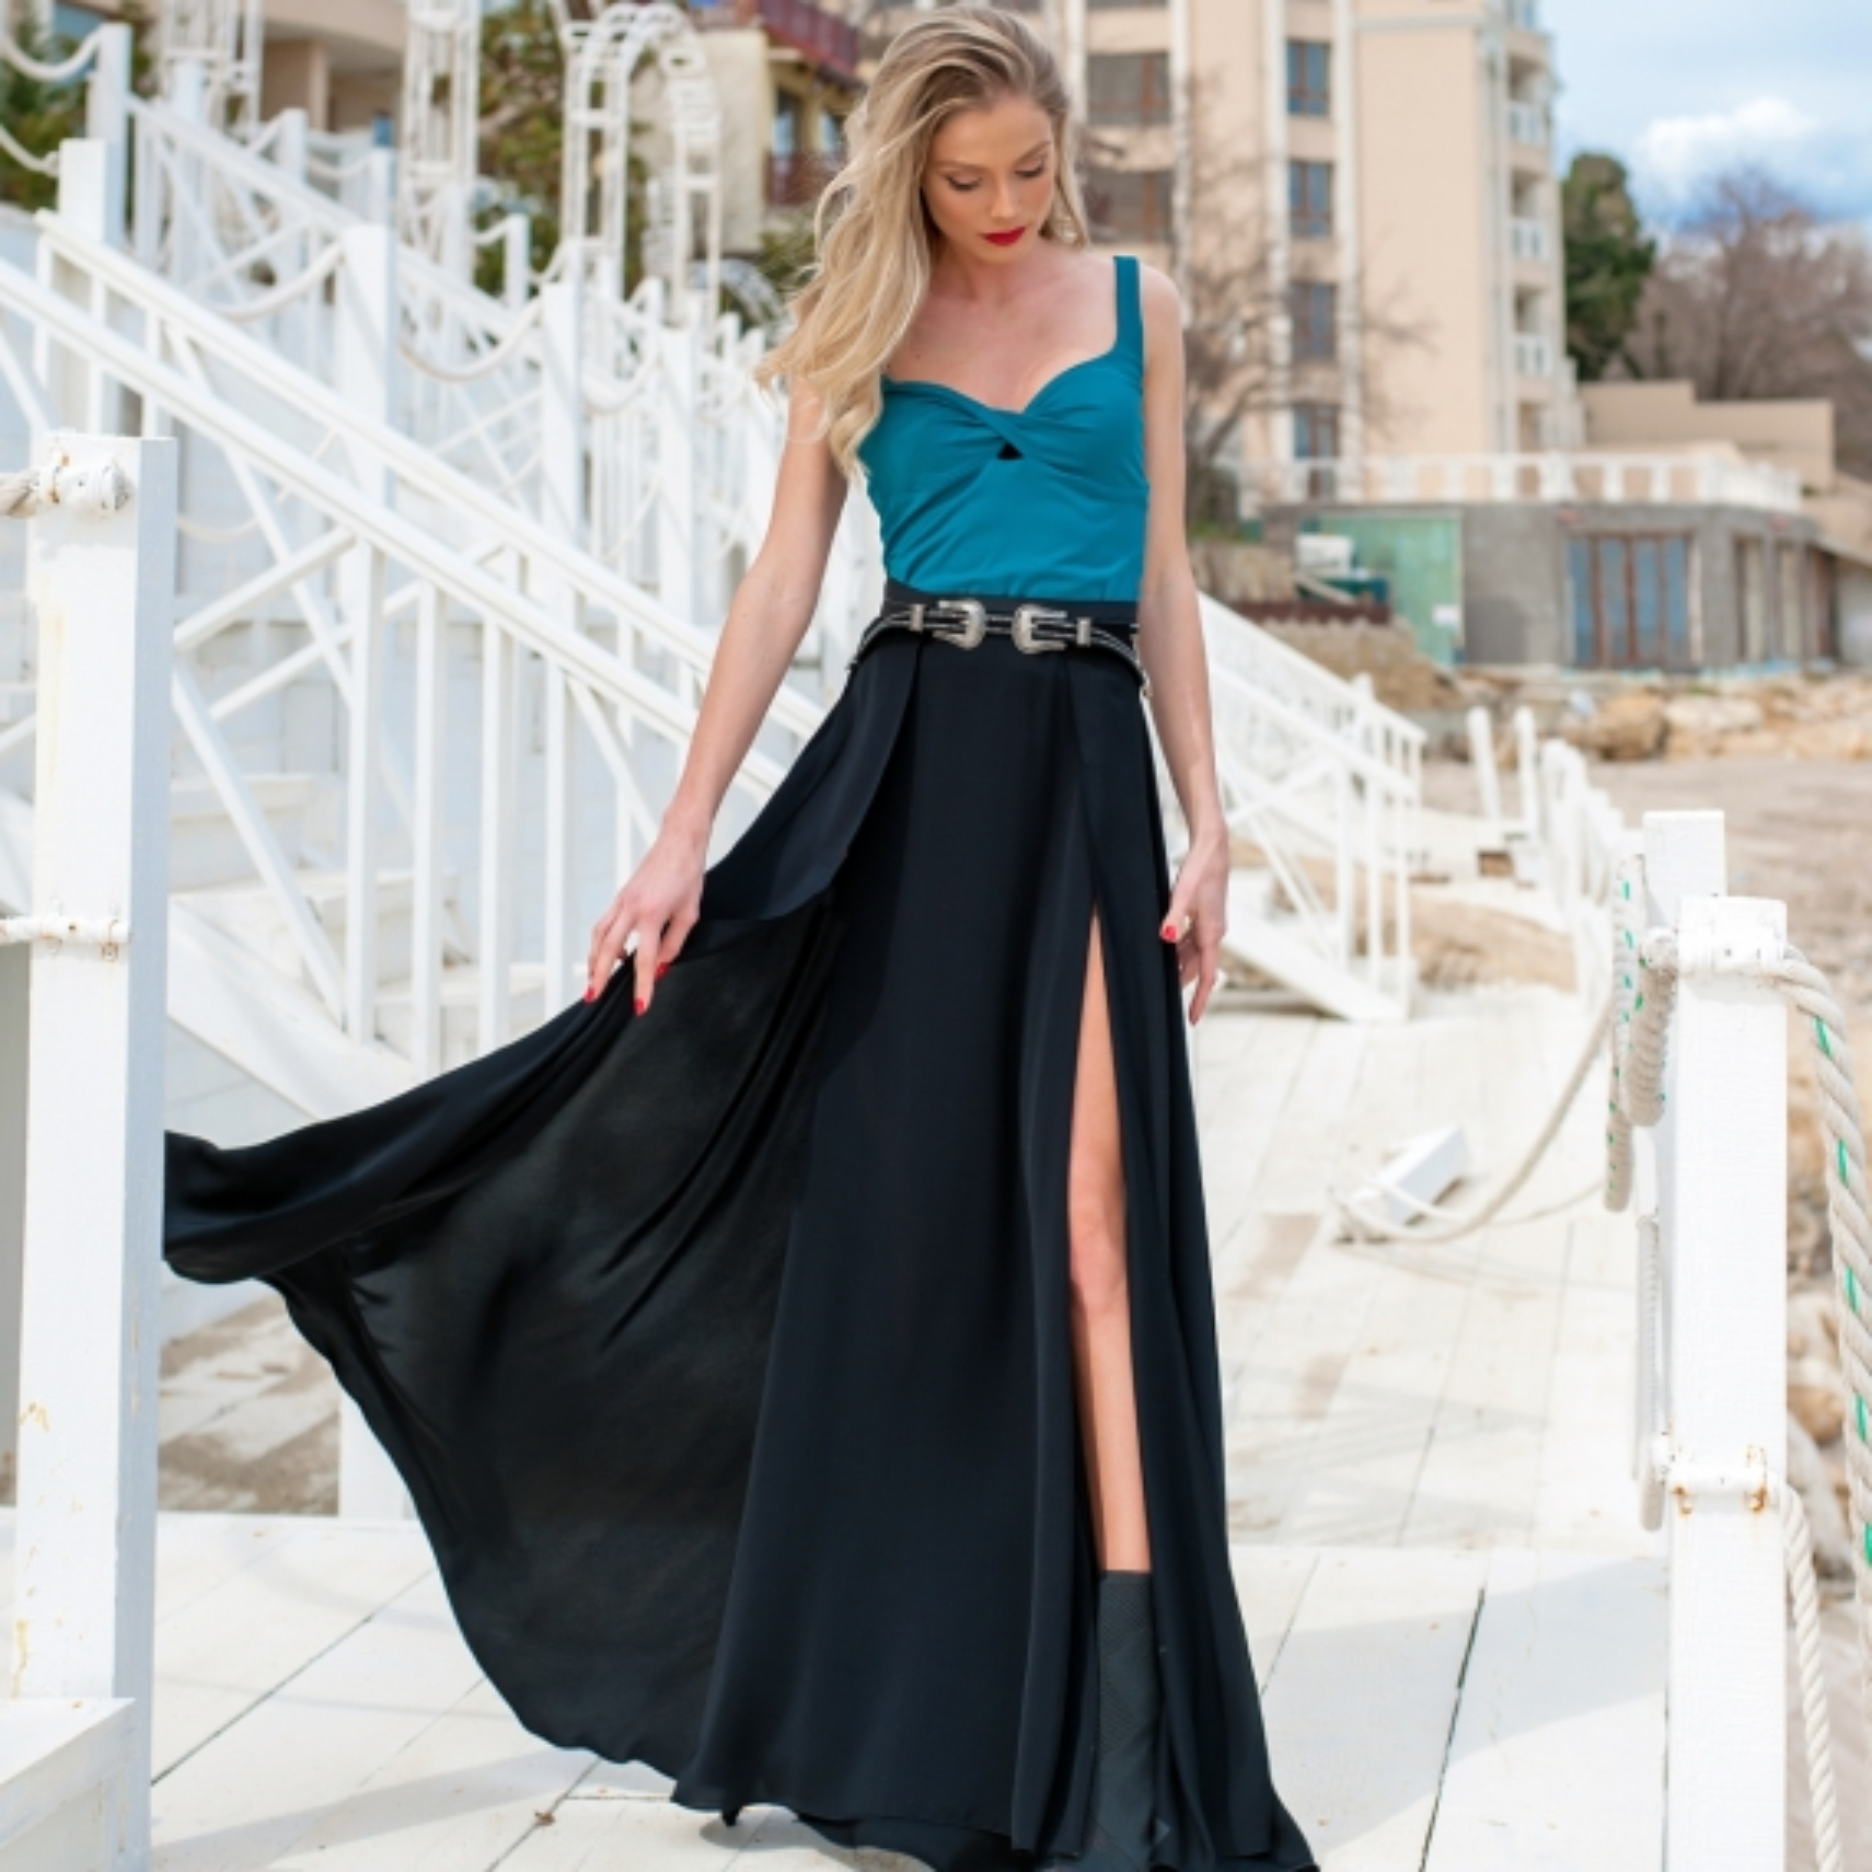 Ефирна пола с висока талия в черно